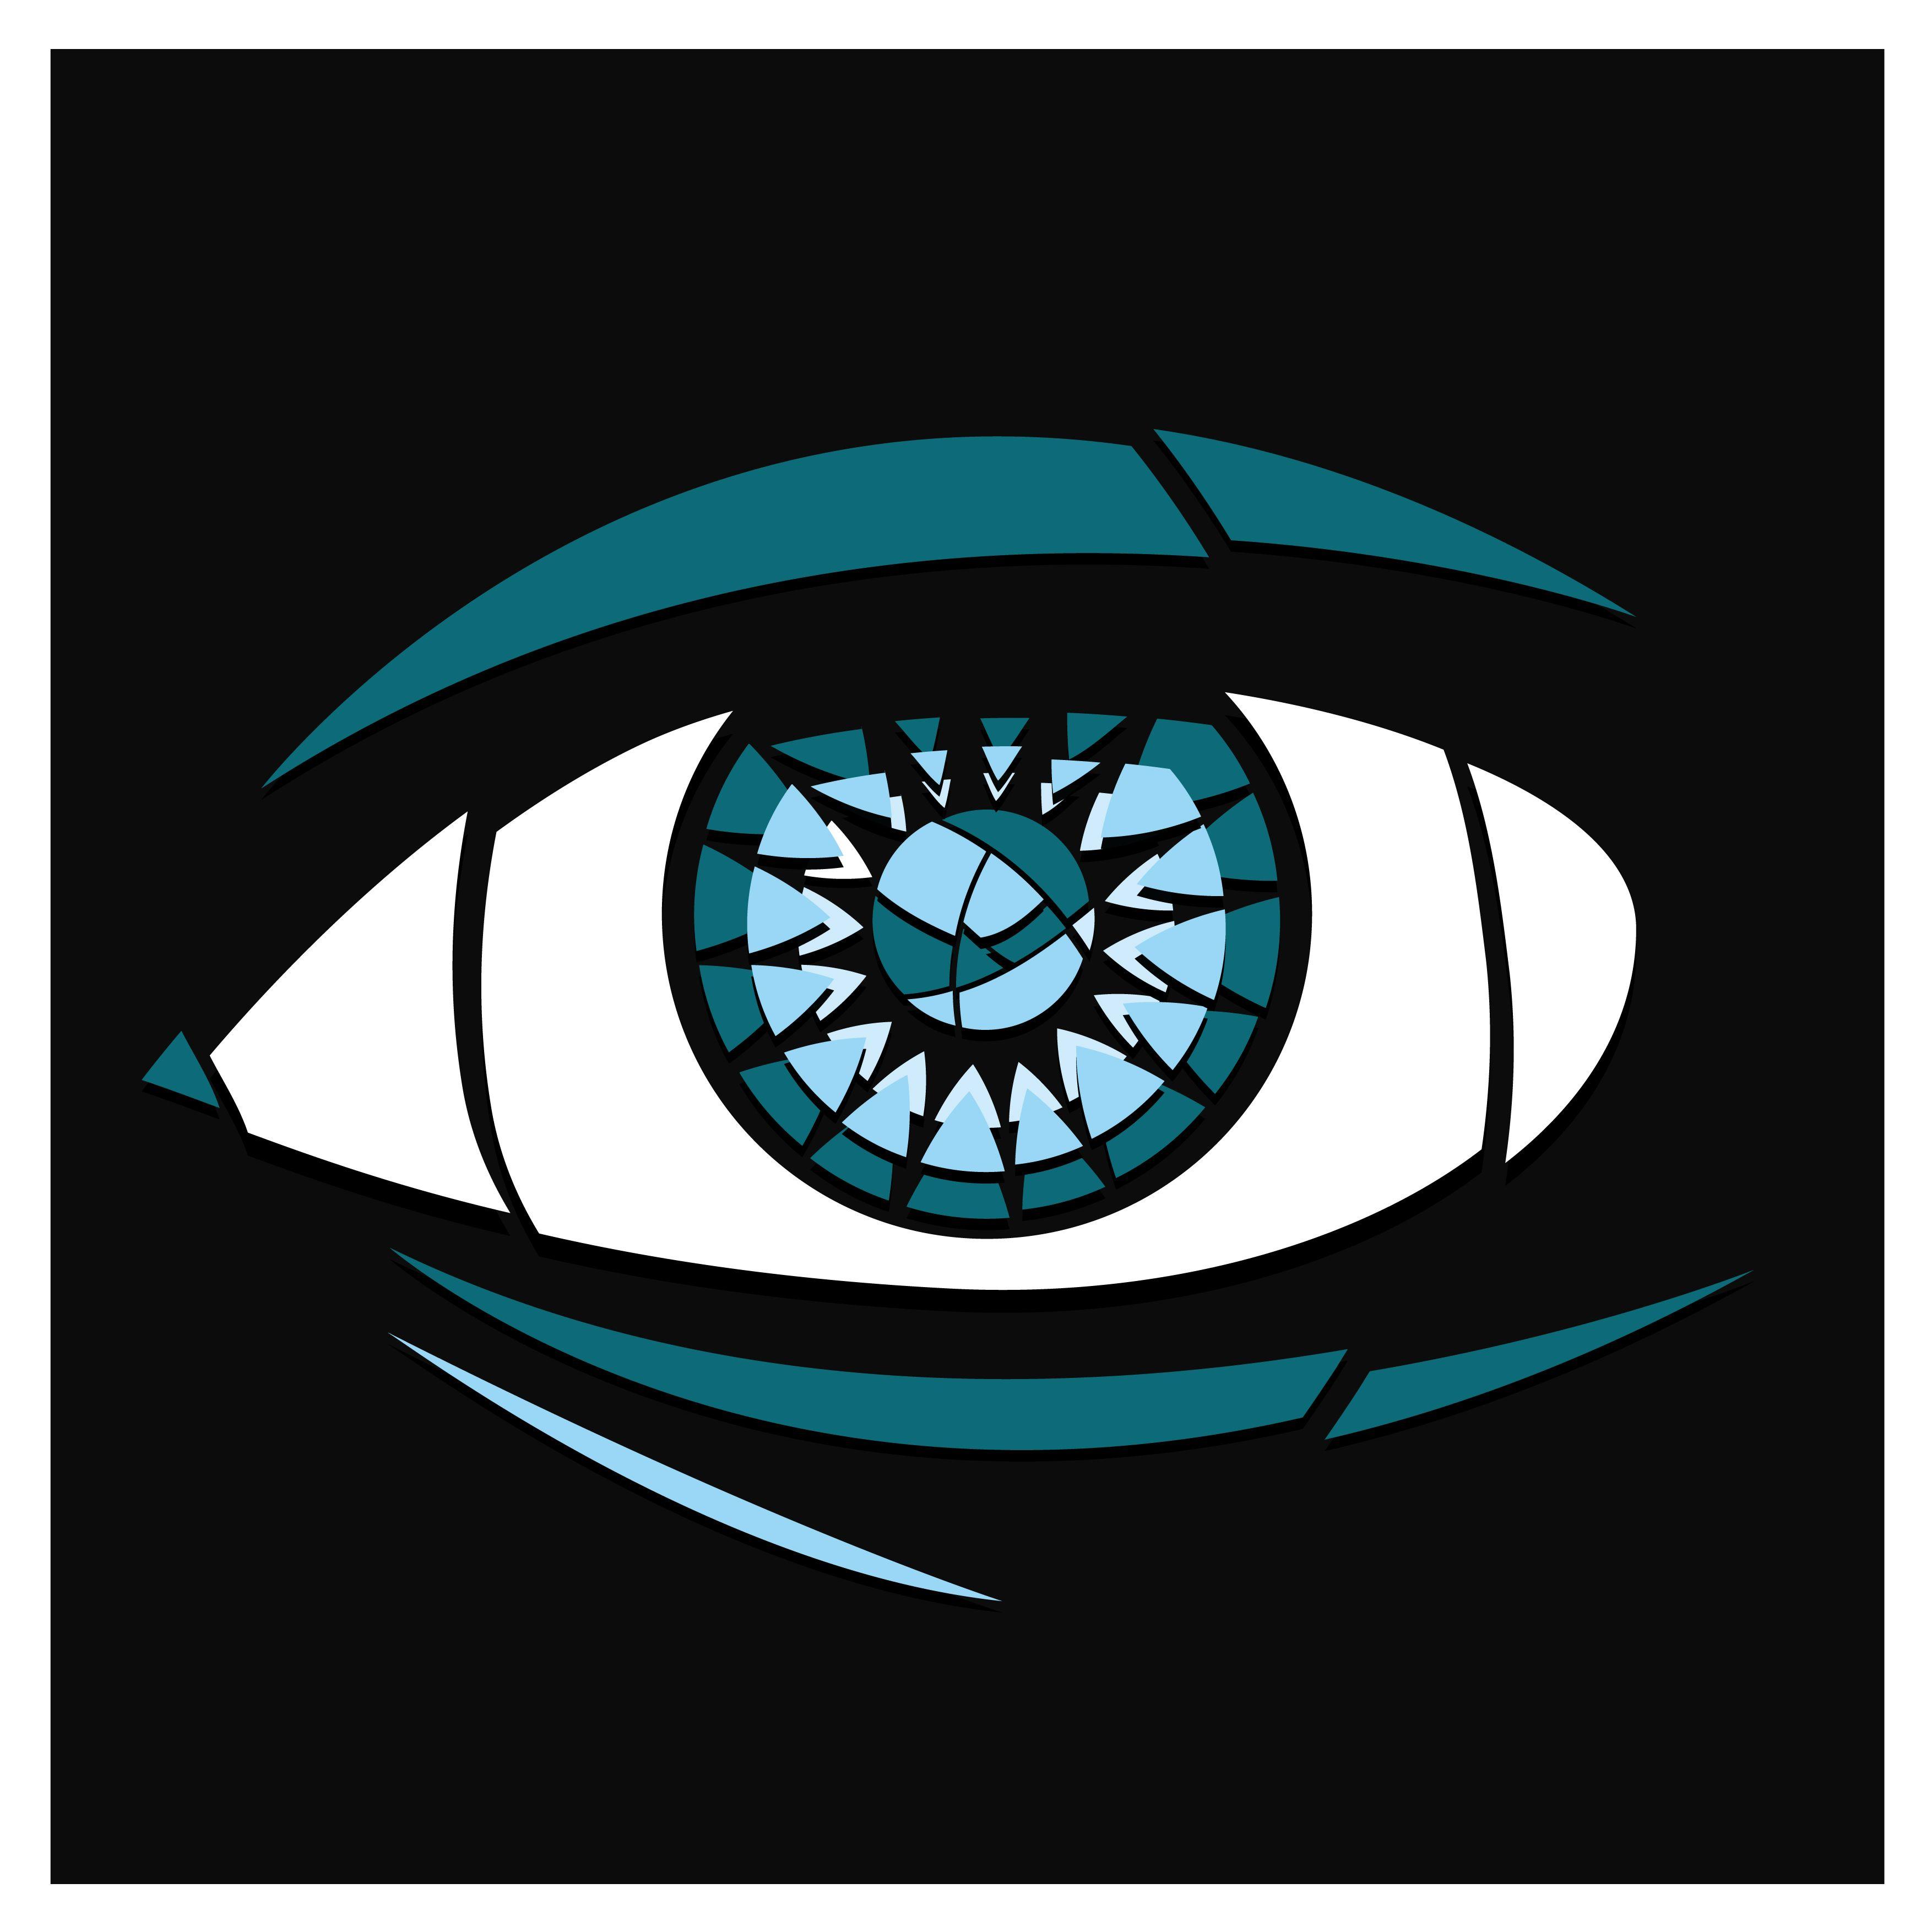 Eye Adobe Illustrator Modern Vector Digital Art Illustration Drawing Graphic Design Tattoo Illustration Drawings Design